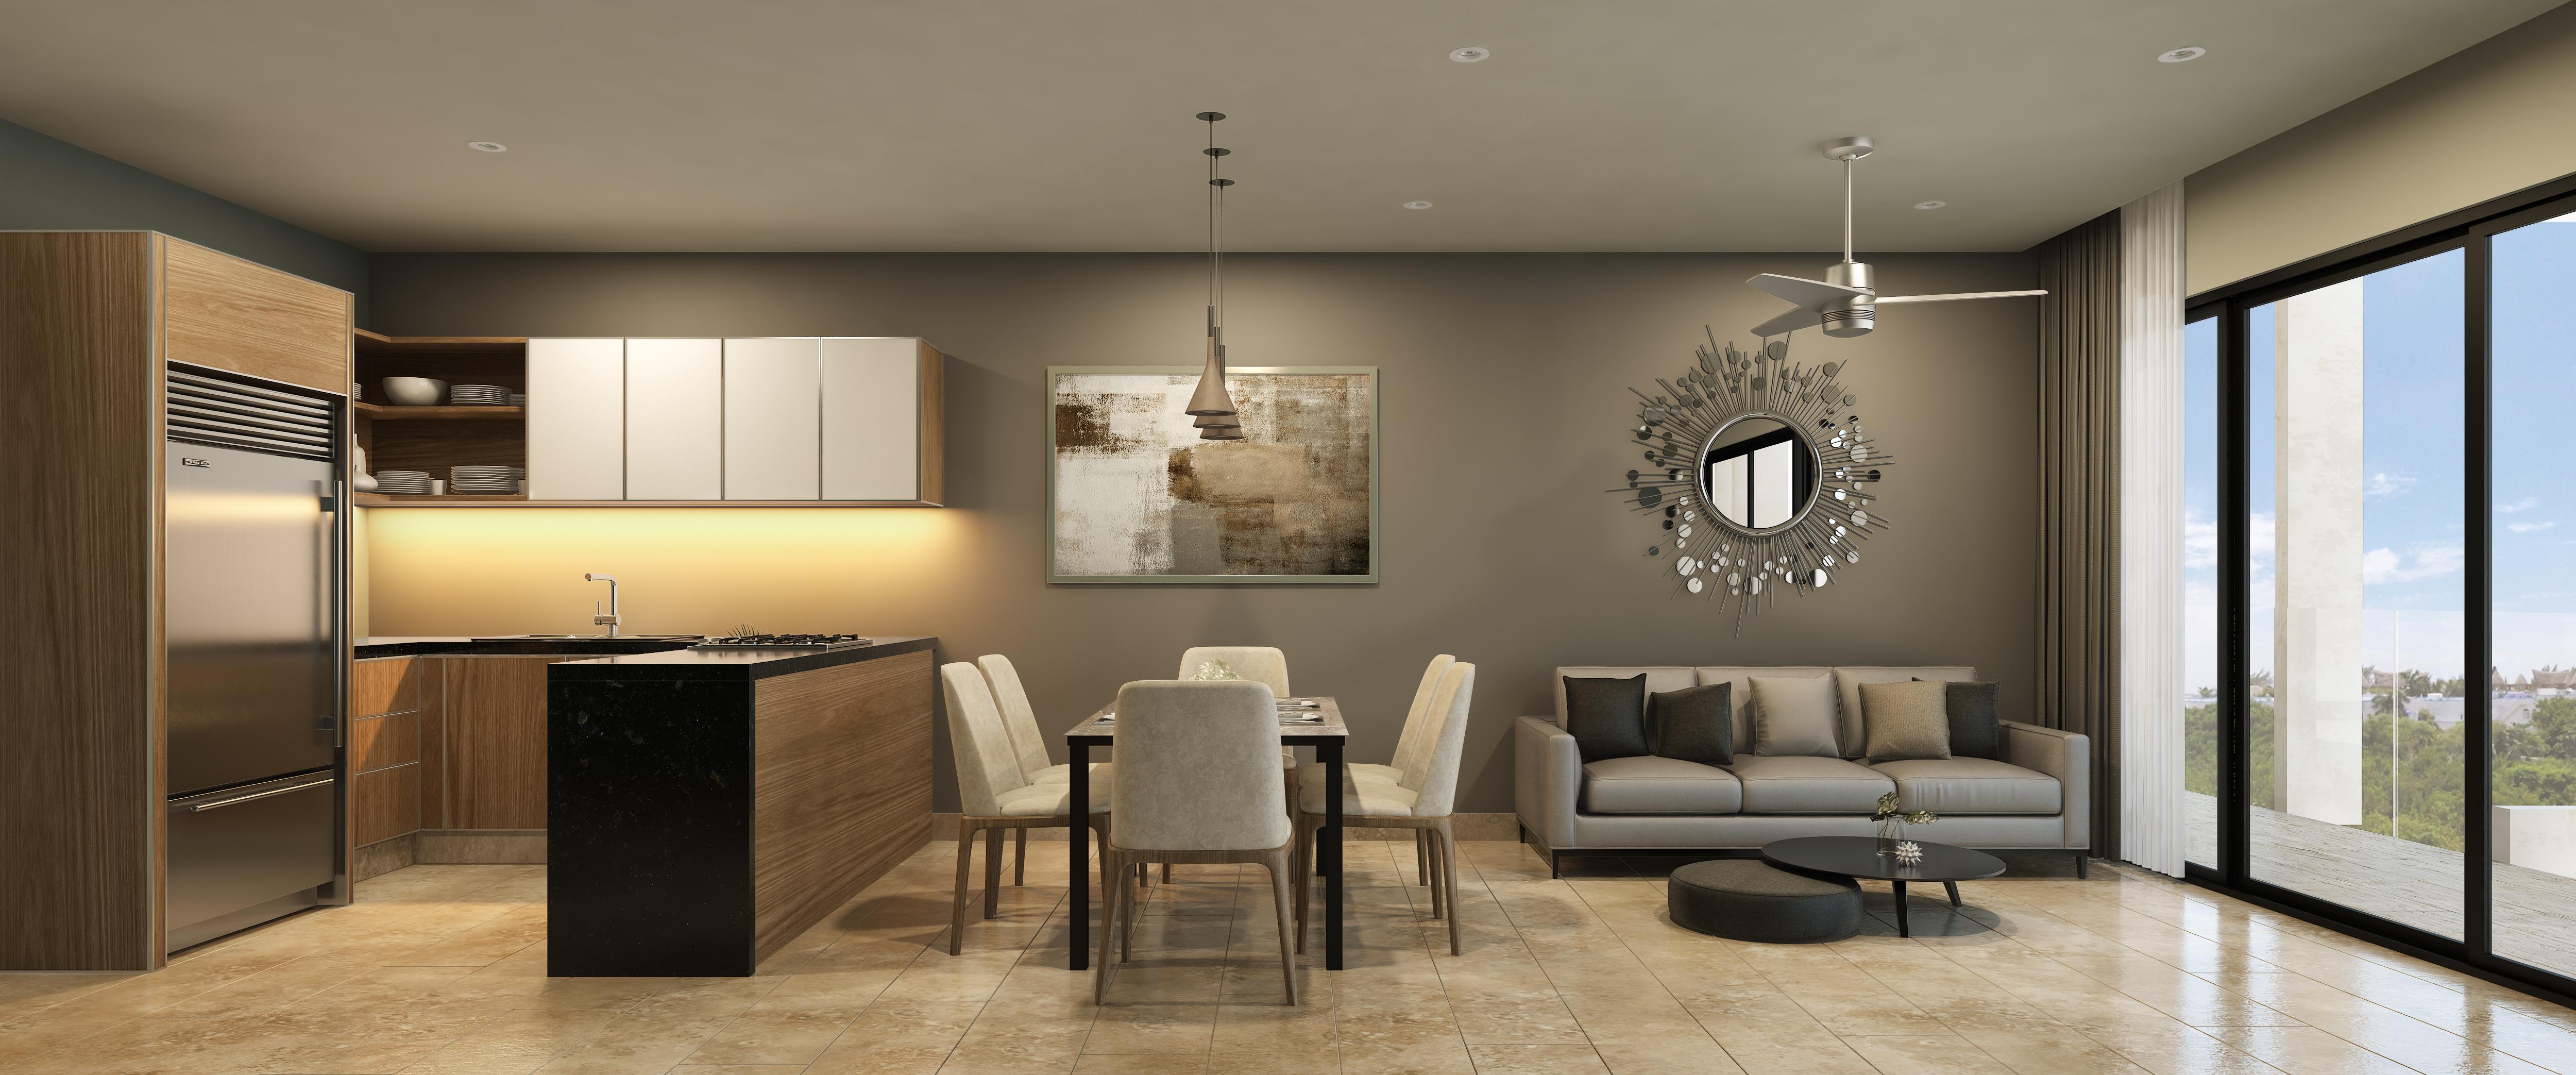 2-bedroom-Resale-with-Financing-LivingRoom